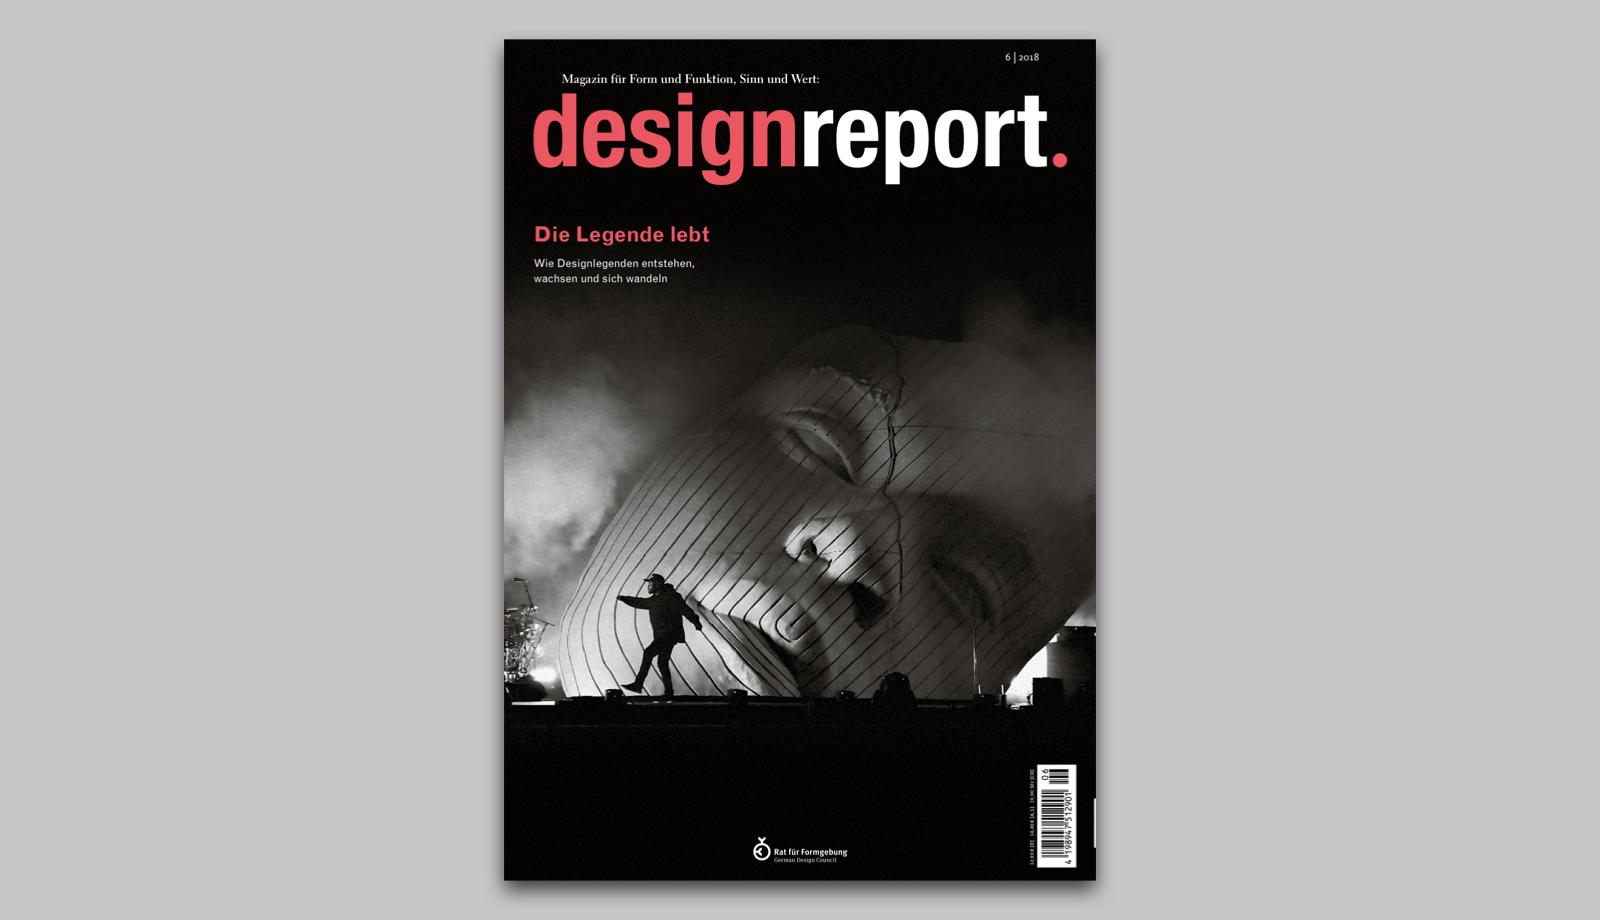 181215_Designgeschichte_ReneSpitz_designreport_HfGUlm-Cover